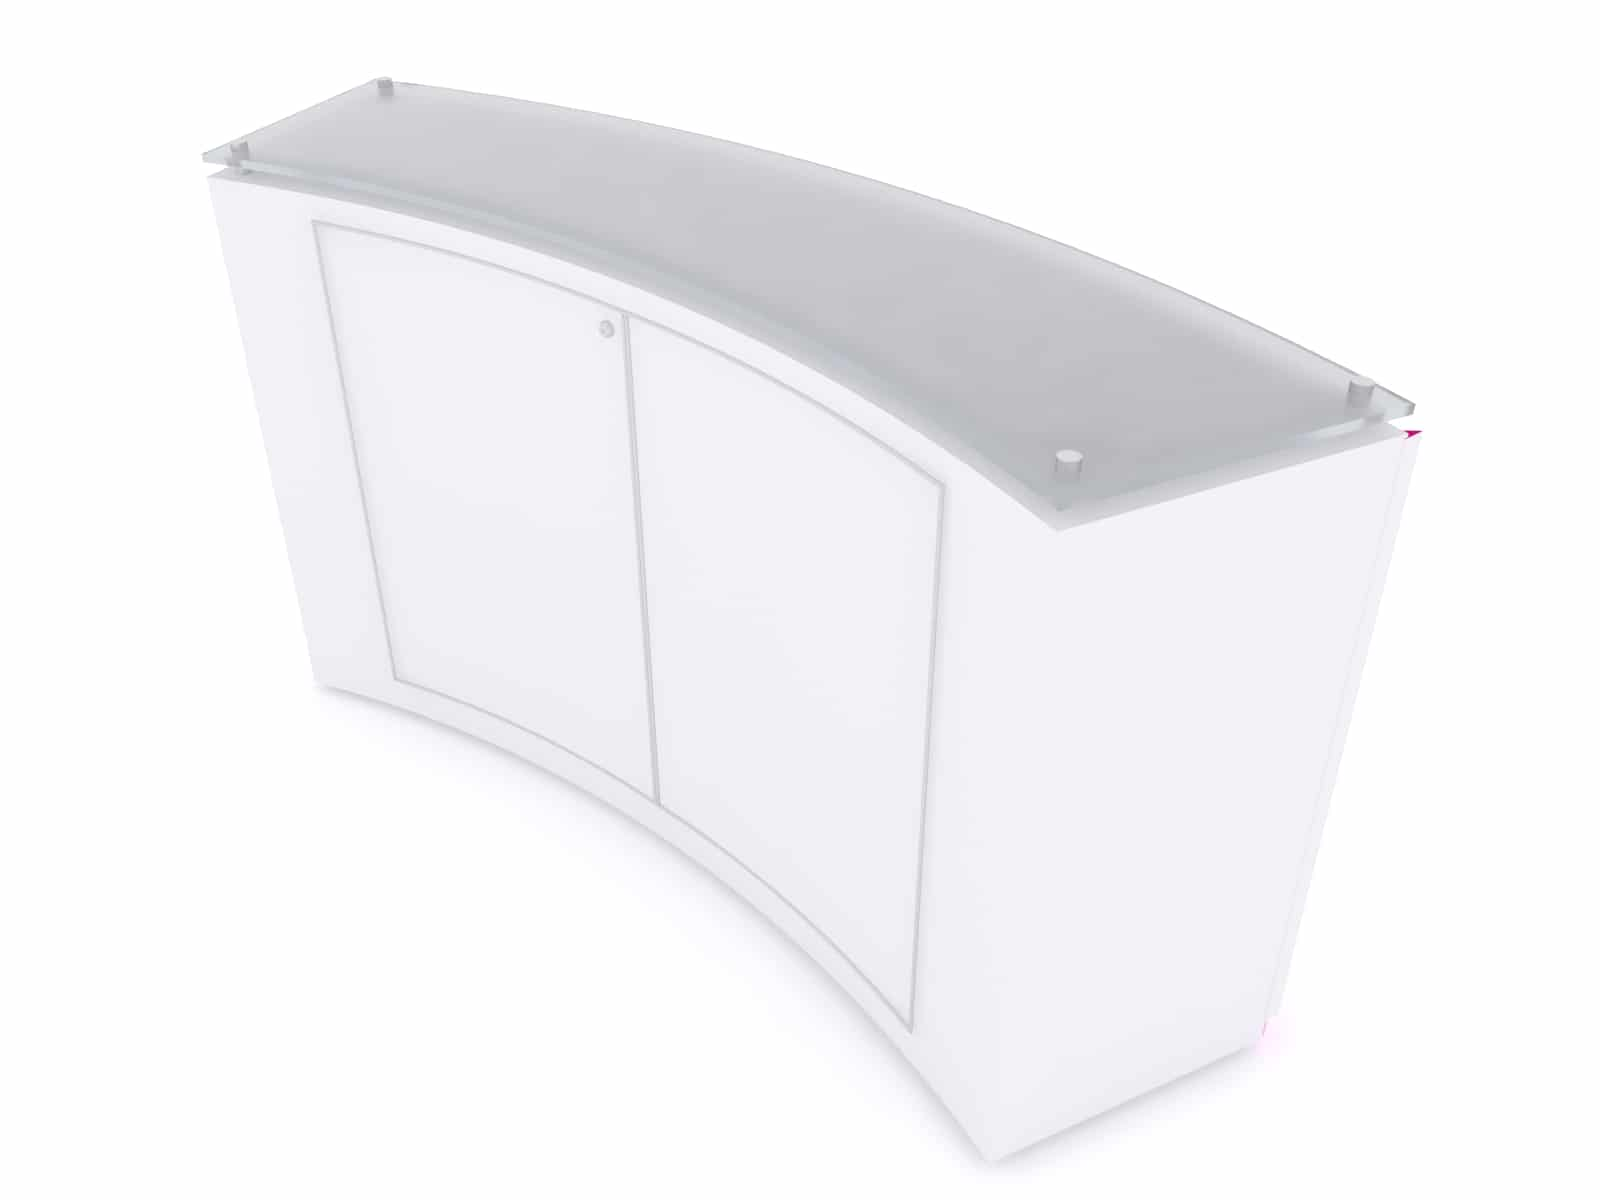 MOD-1554 Trade Show Display Counter - image 2